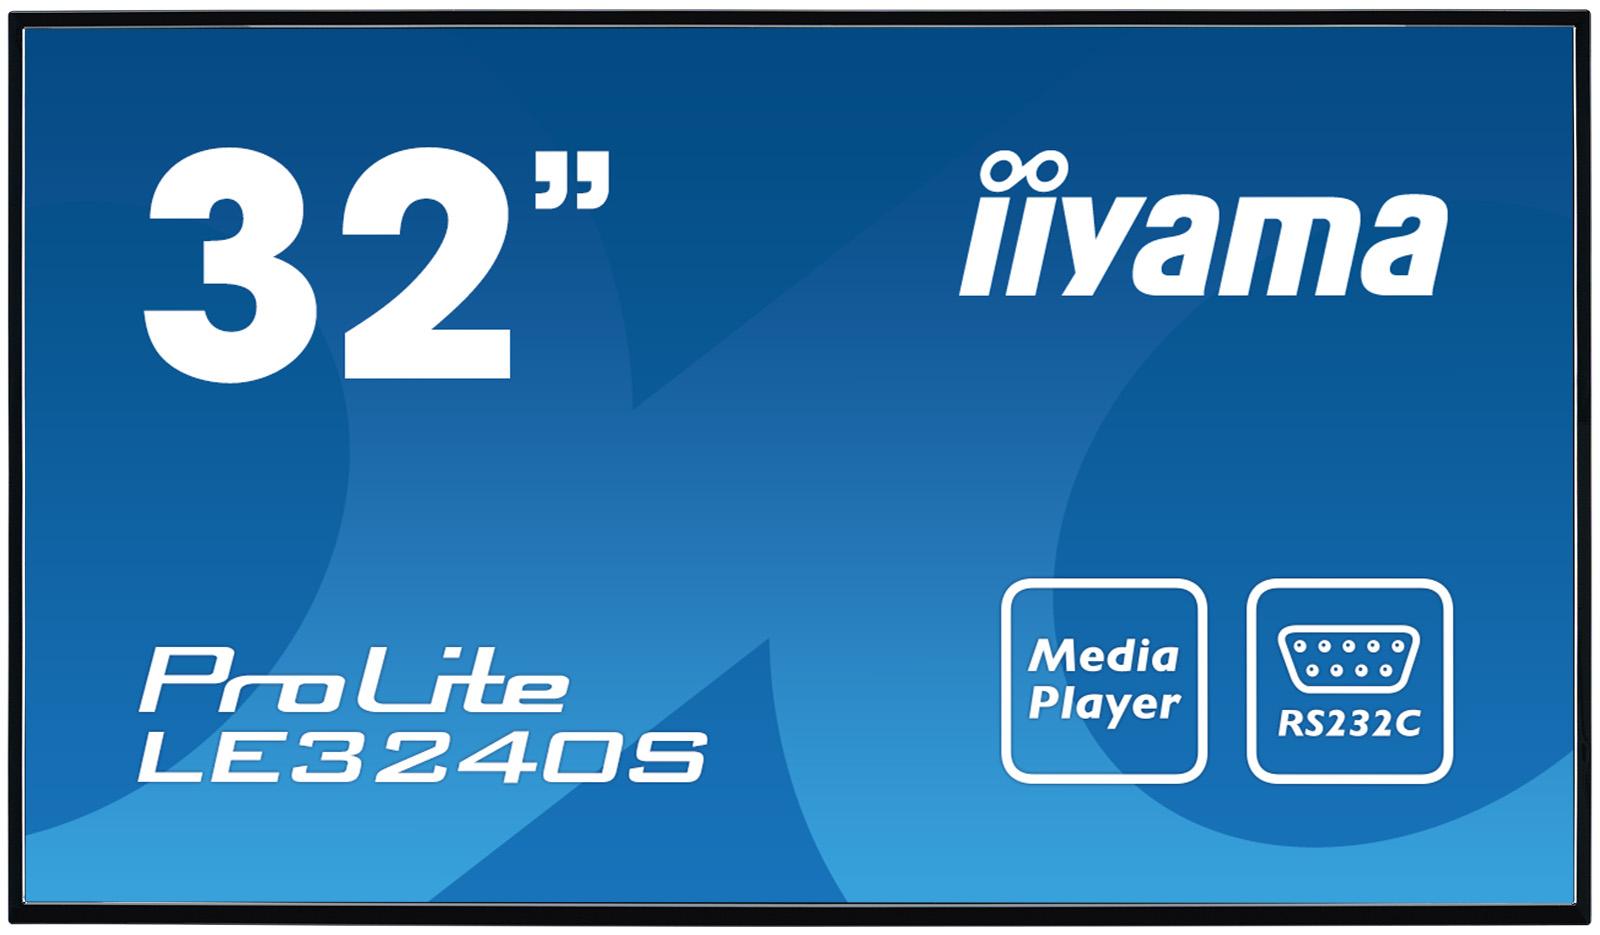 "32"" LCD iiyama ProLite LE3240S-B1 -FullHD, IPS, 8ms, 350cd, USB 2.0 media player, RJ45, RS232C,repro"